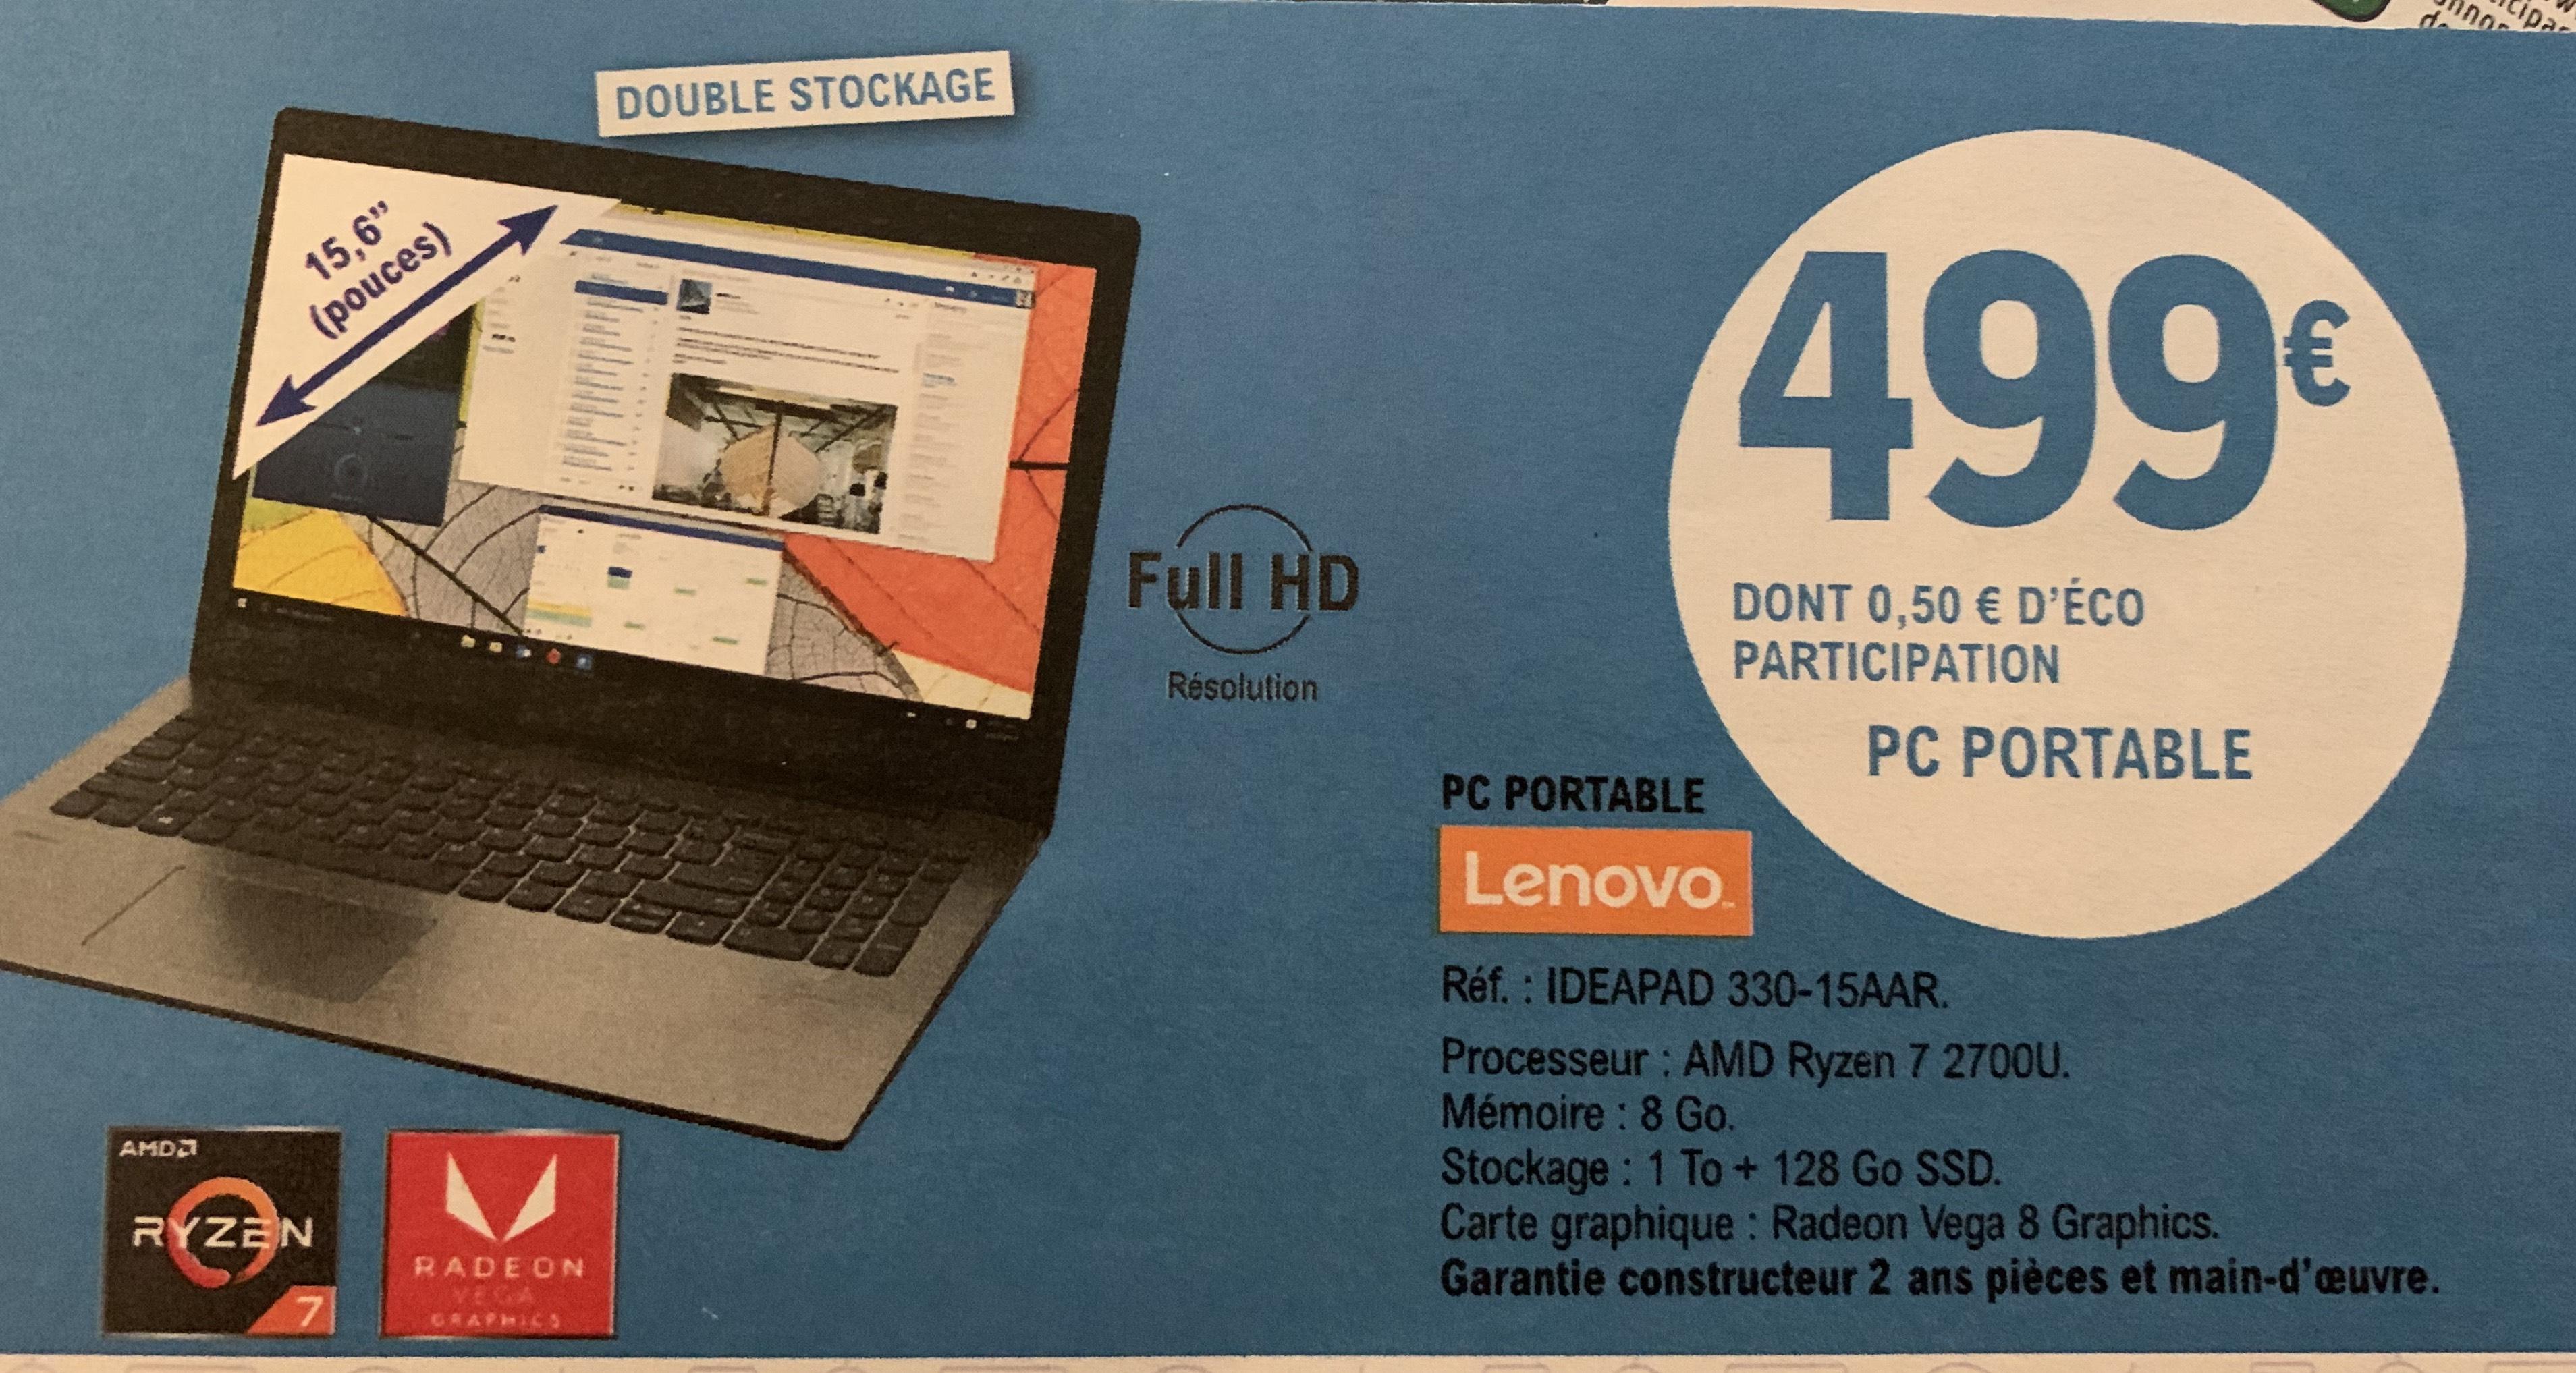 "PC Portable 15.6"" Lenovo Ideapad 330-15AAR - Ryzen 7, 8 Go de Ram, 1 To + 128 SSD, Vega 8 - Osny (95)"